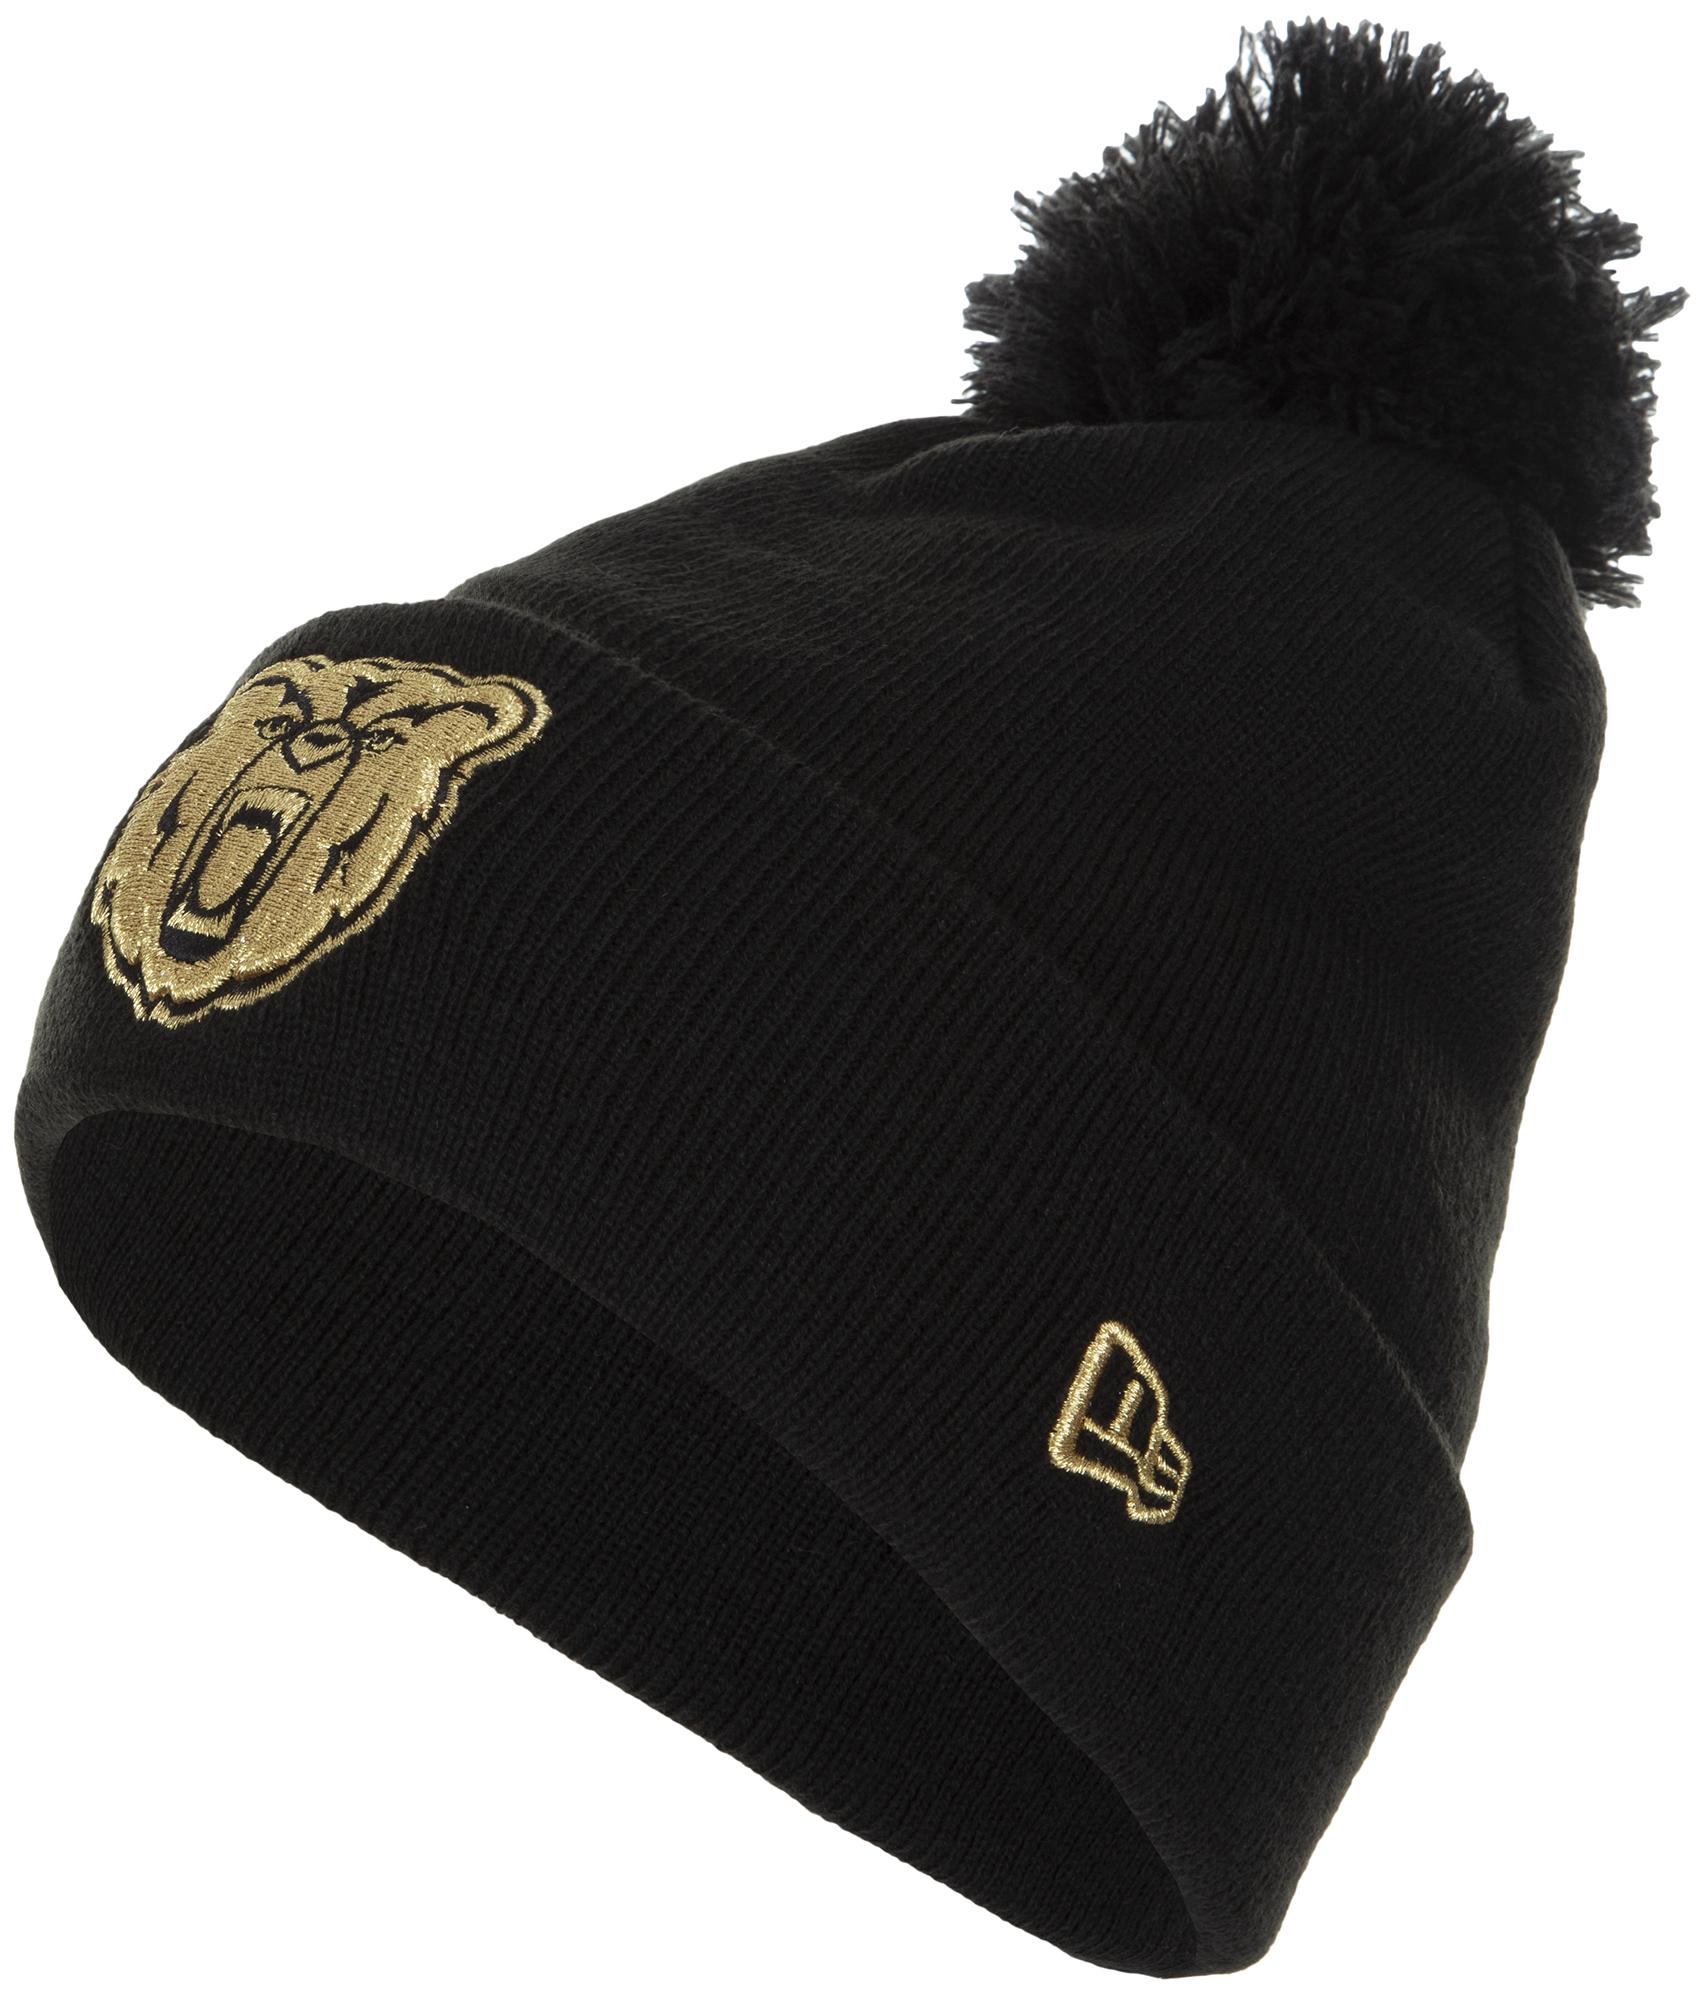 New Era Шапка New Era Lic 883 Gold Bear Knit new era шапка new era lic 801 essential cuff knit размер без размера